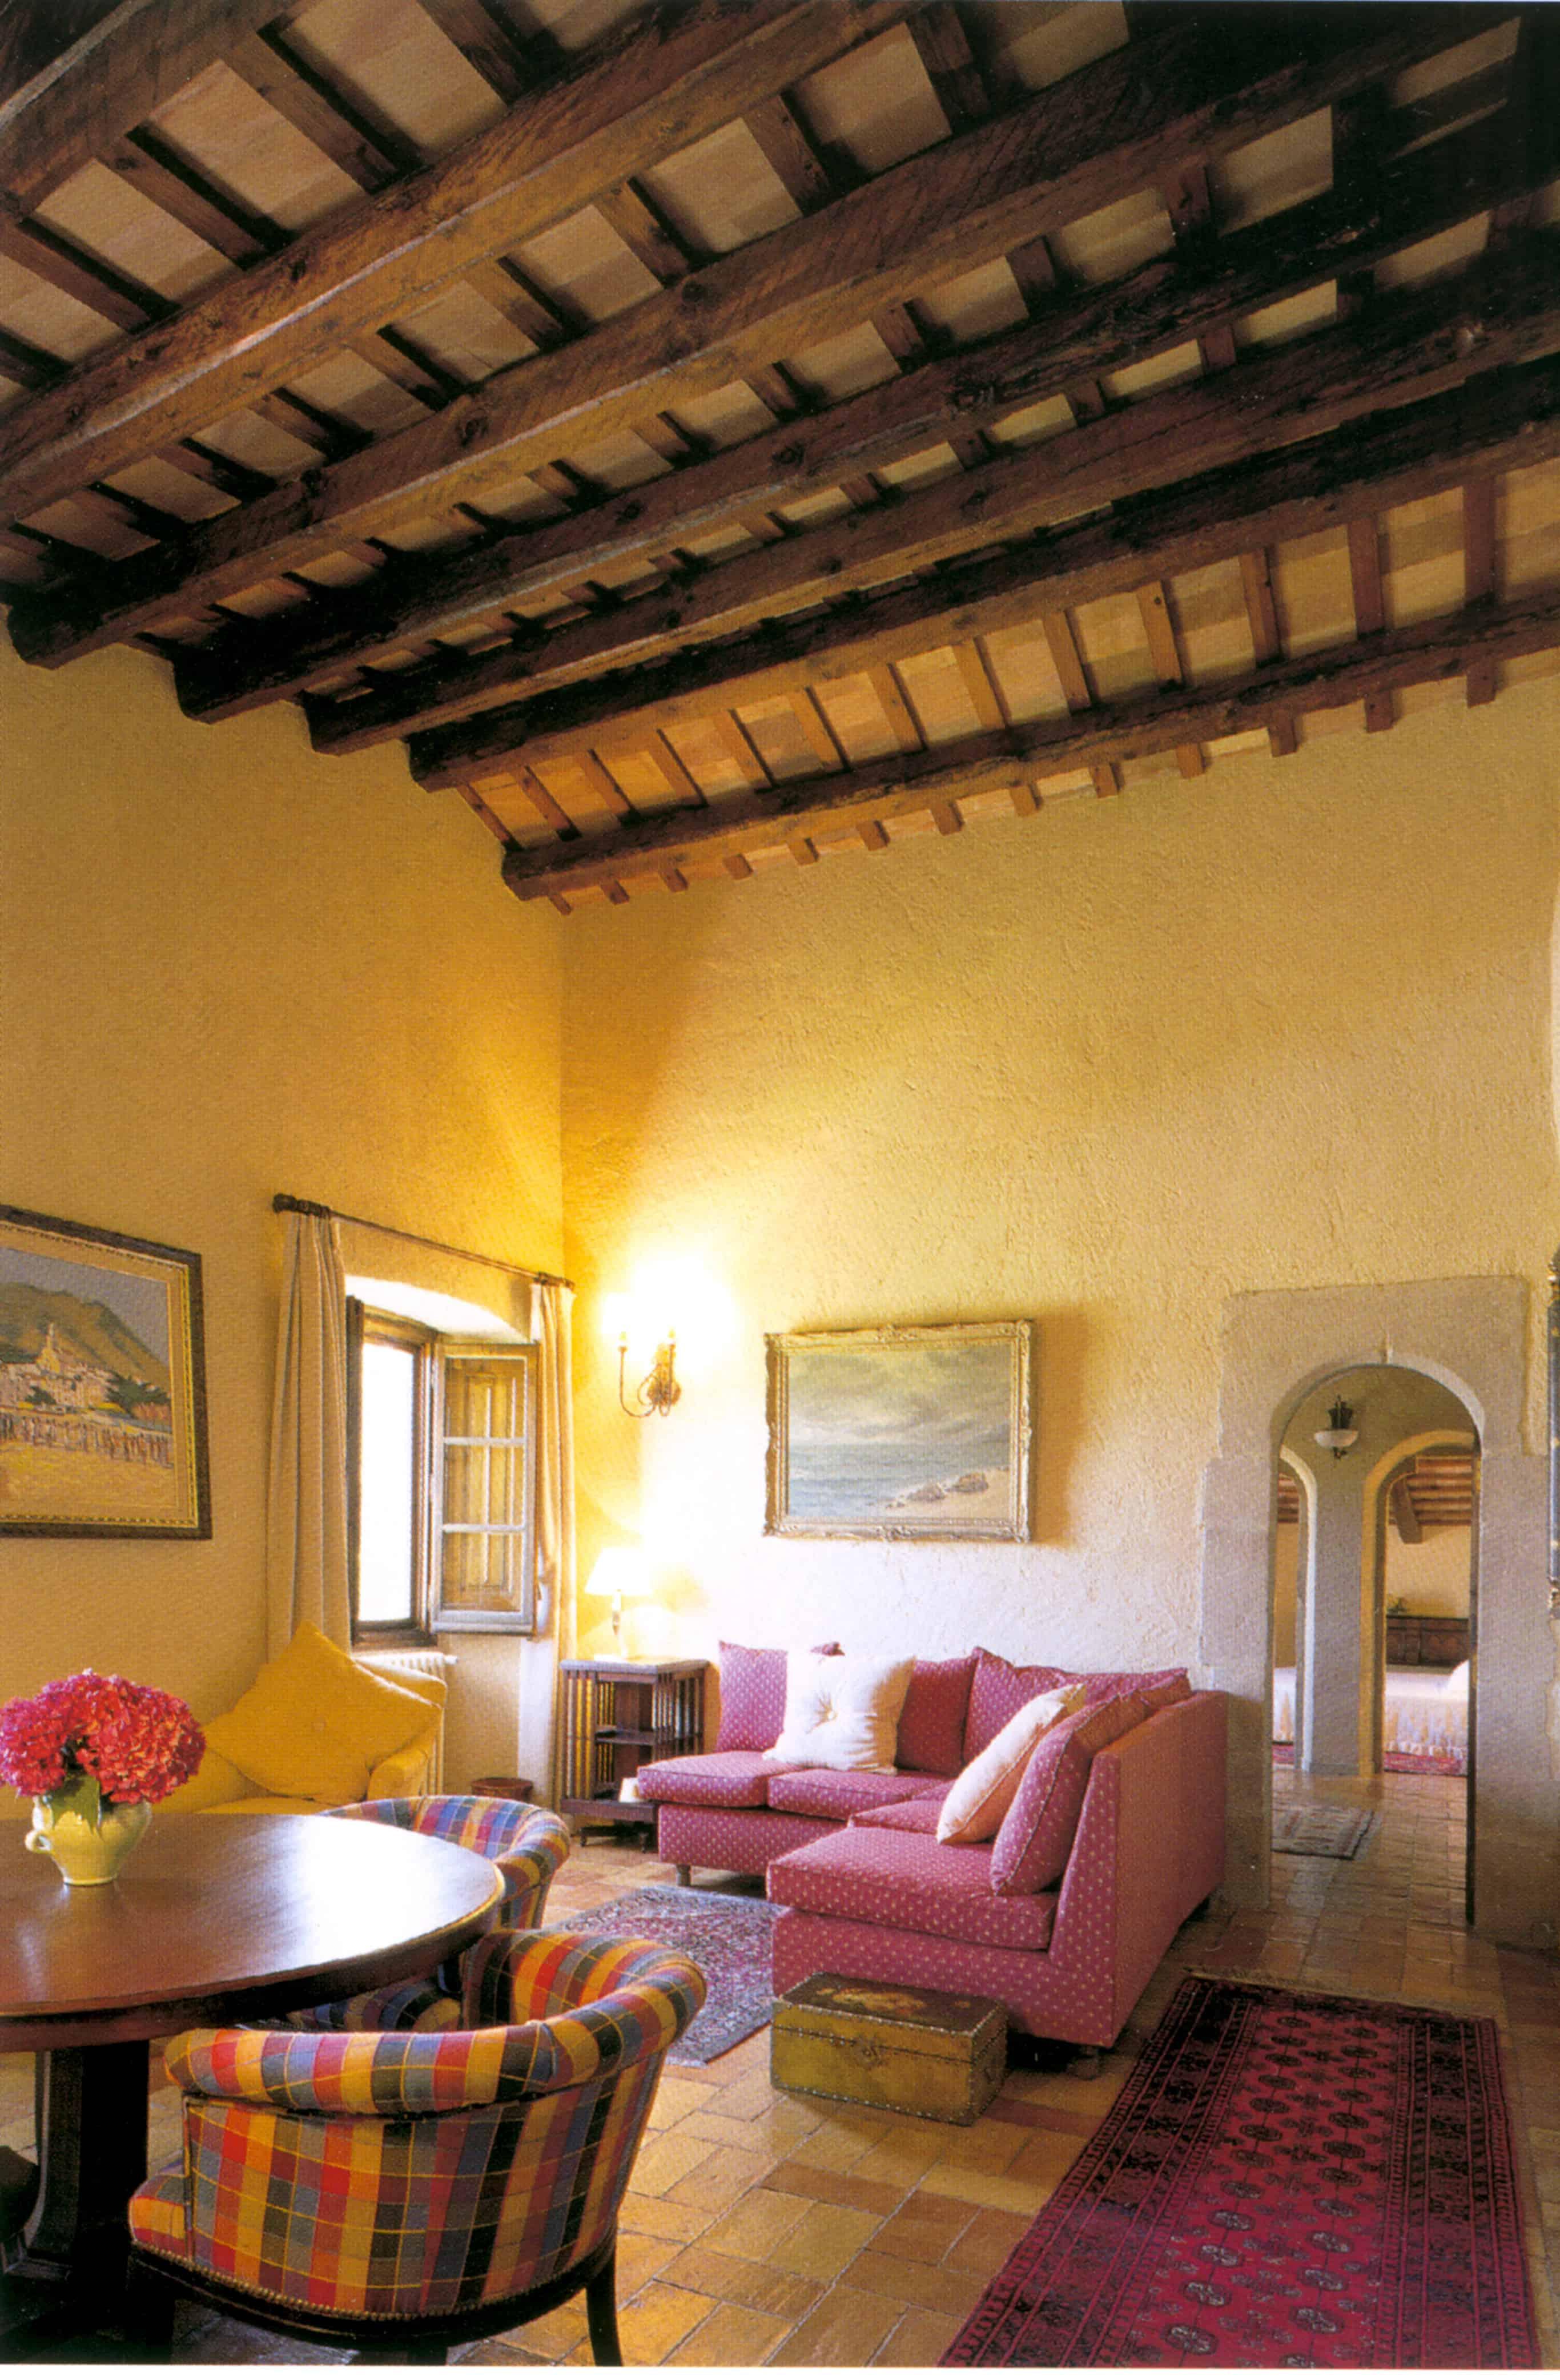 INDOOR Ξ Architecture Solution Tuscan Interior Style